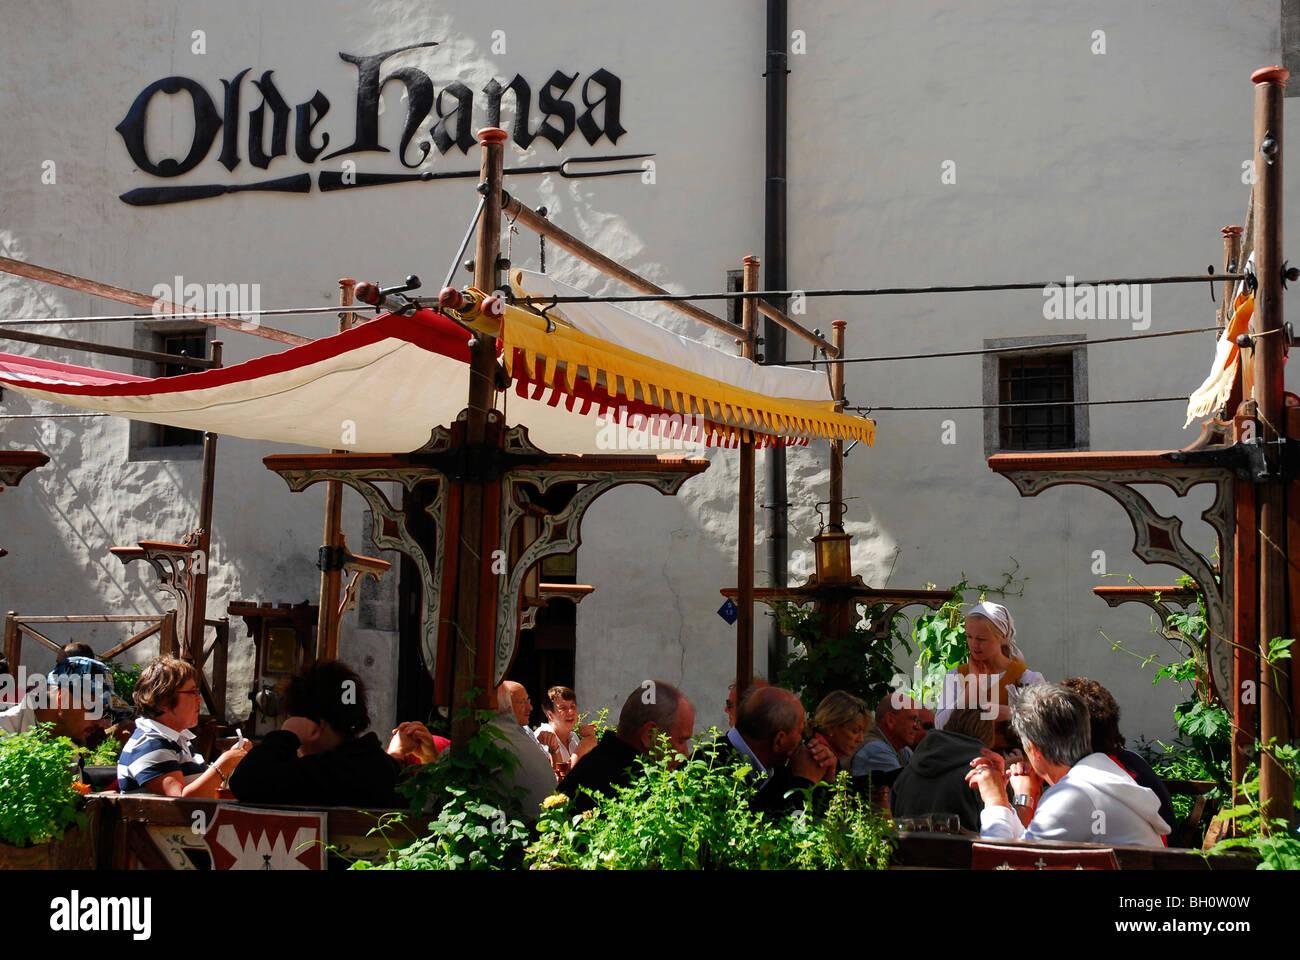 Olde Hansa Restaurant, which serves medievel dishes, Tallinn, Estonia - Stock Image